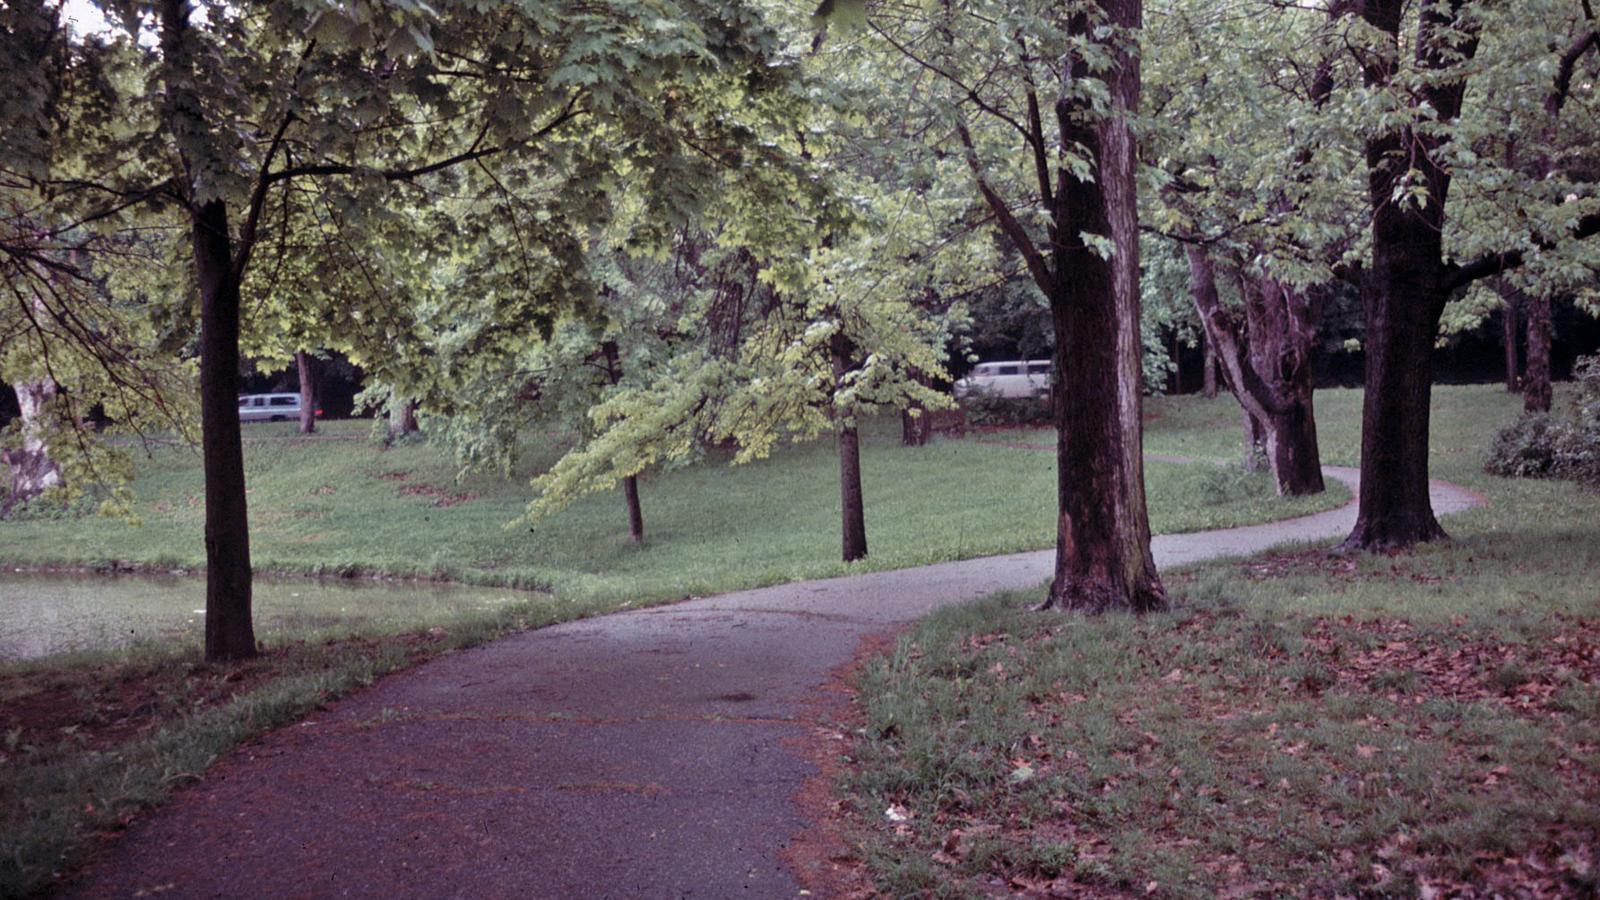 NY_Newburgh_DowningPark_signature_CharlesBirnbaum_1990_03.jpg